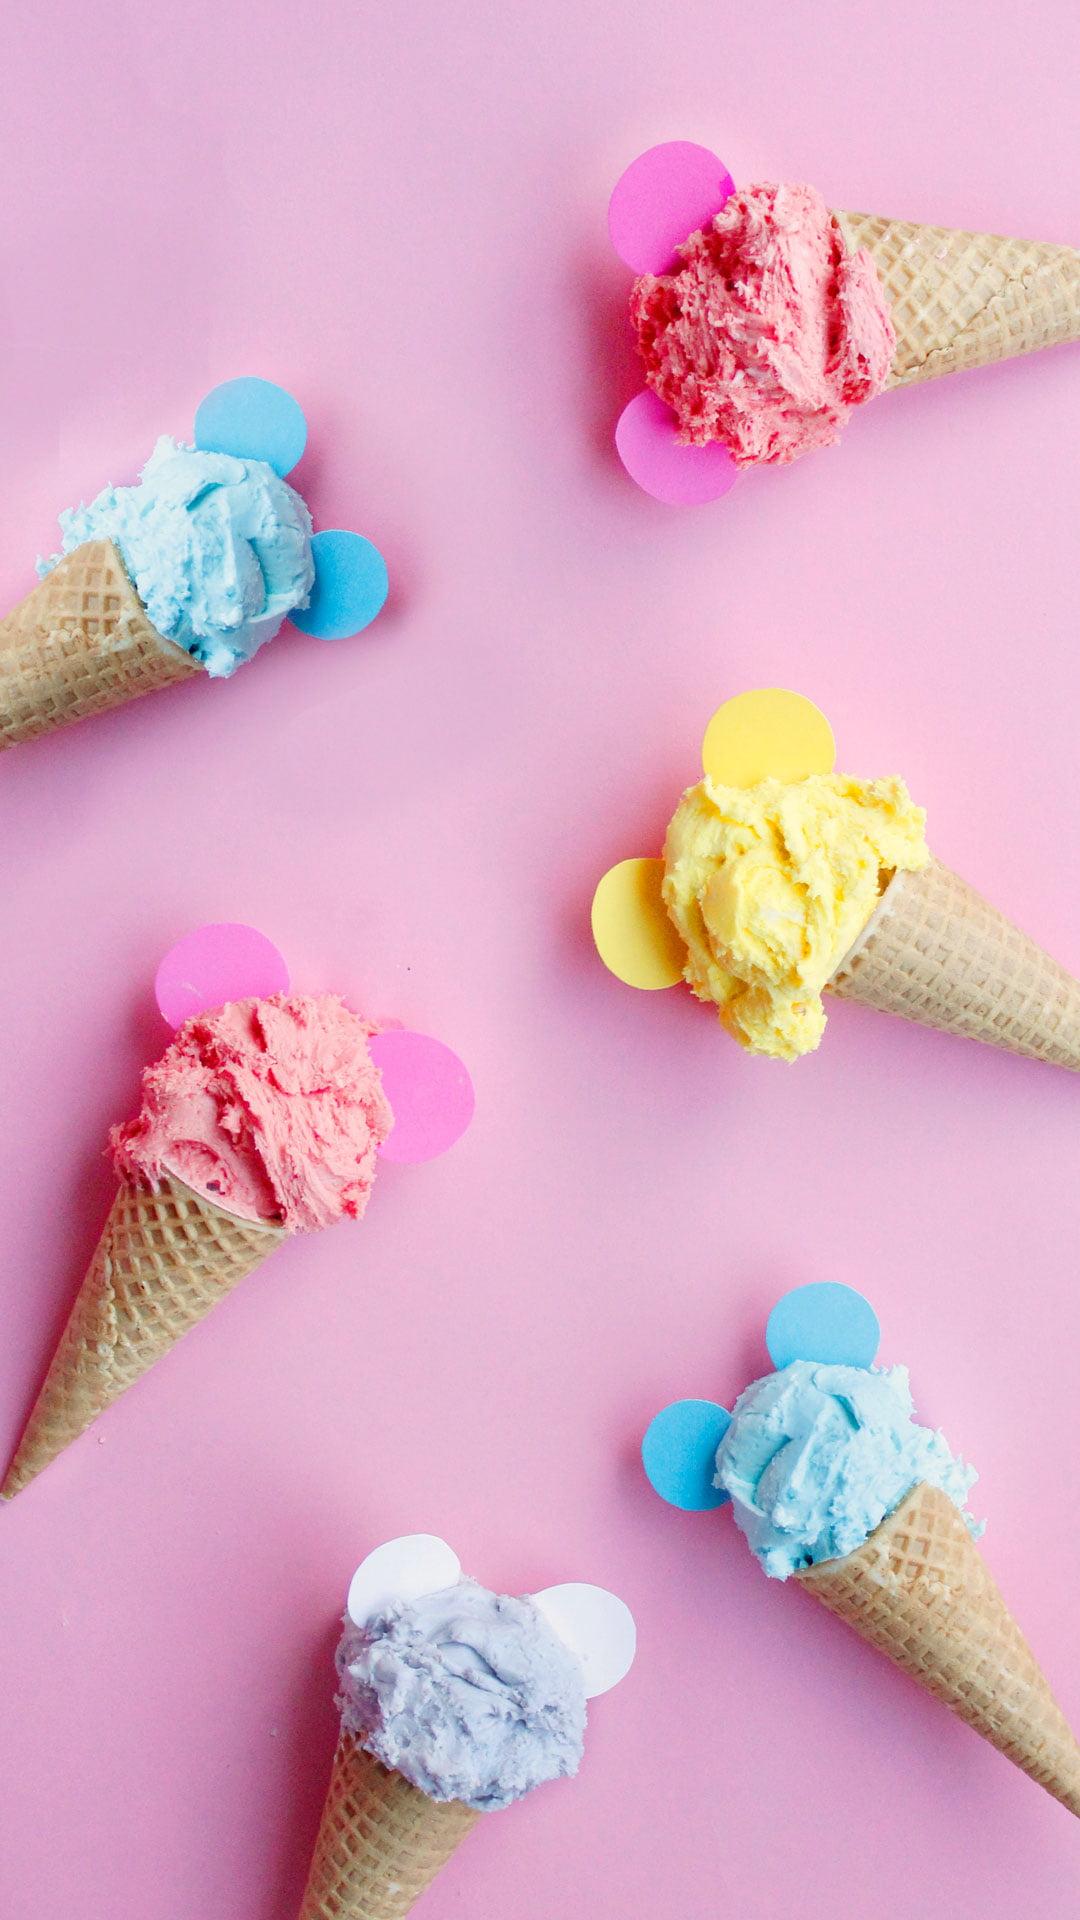 Ice cream | iPhone Wallpapers